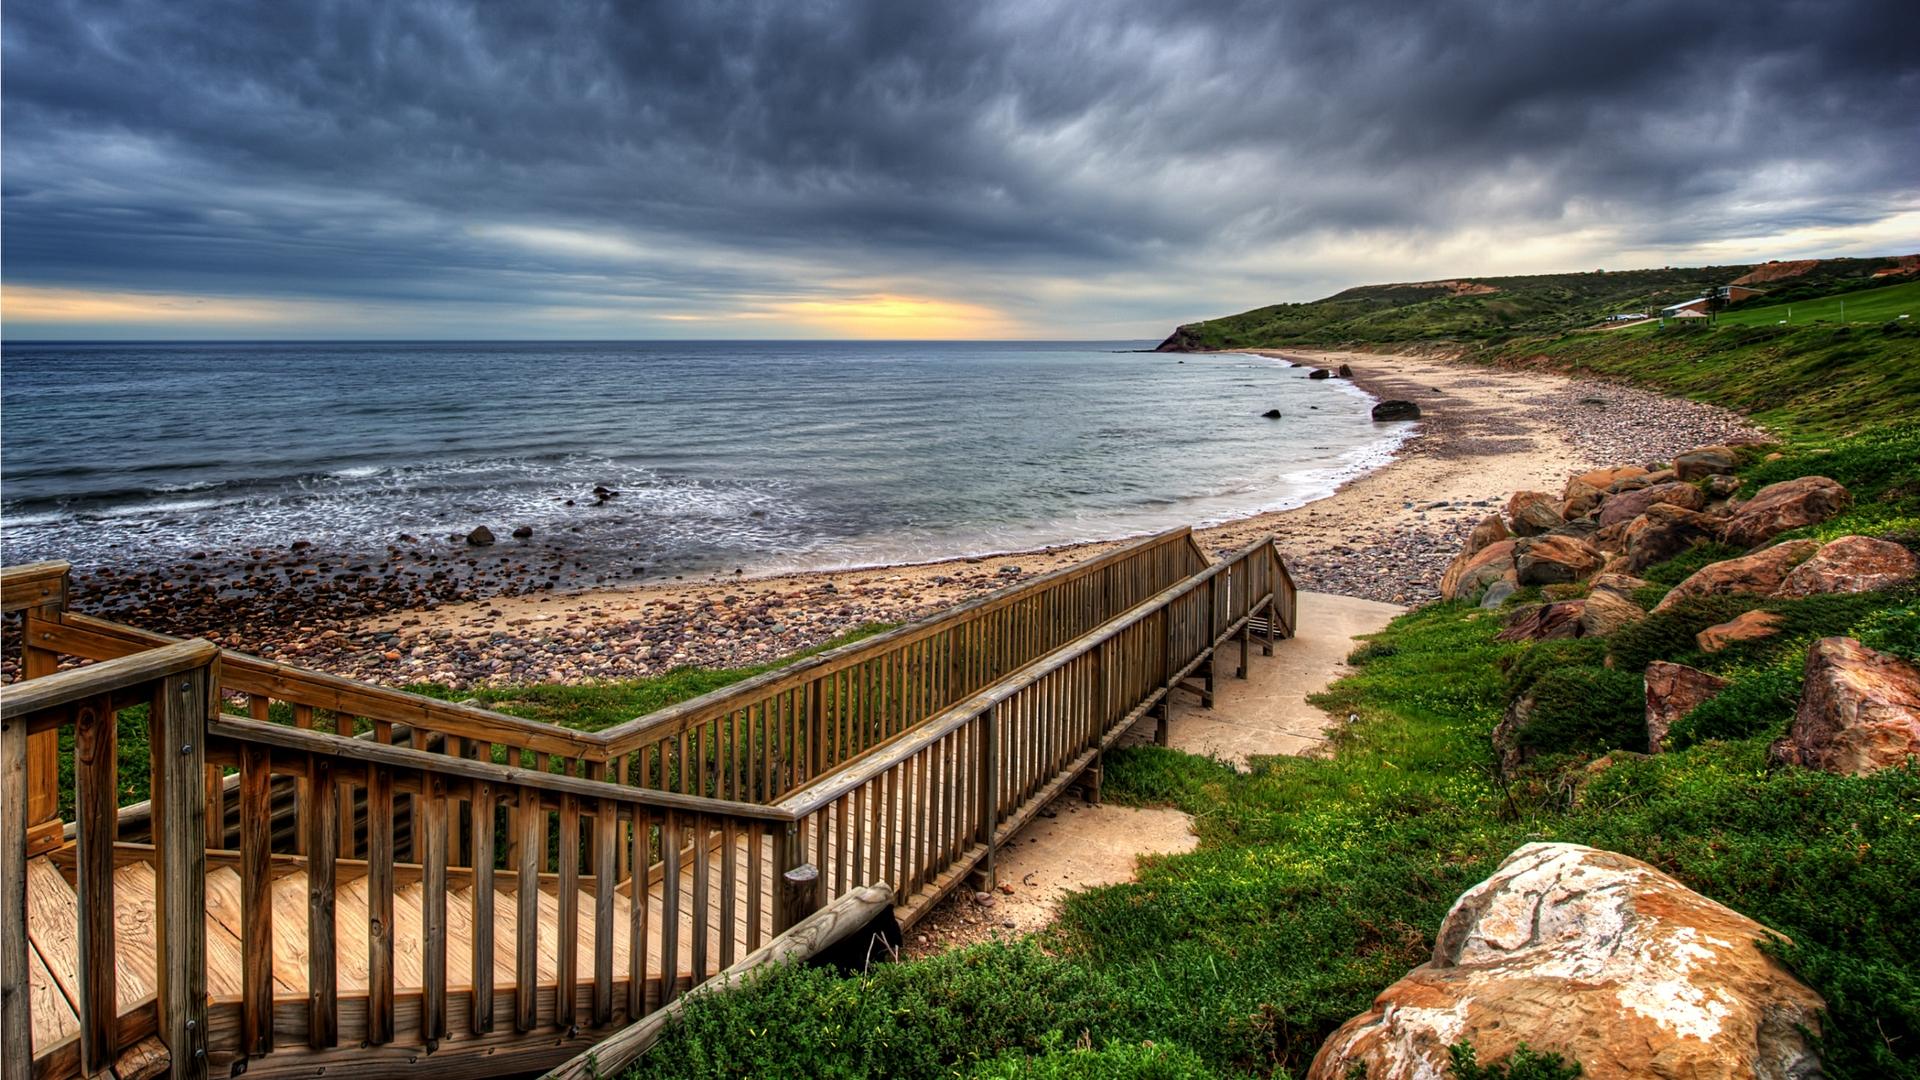 Wallpaper Dump.. HDR Nature-nature-landscapes_hdwallpaper_wooden-walkway-beach-hdr_2090